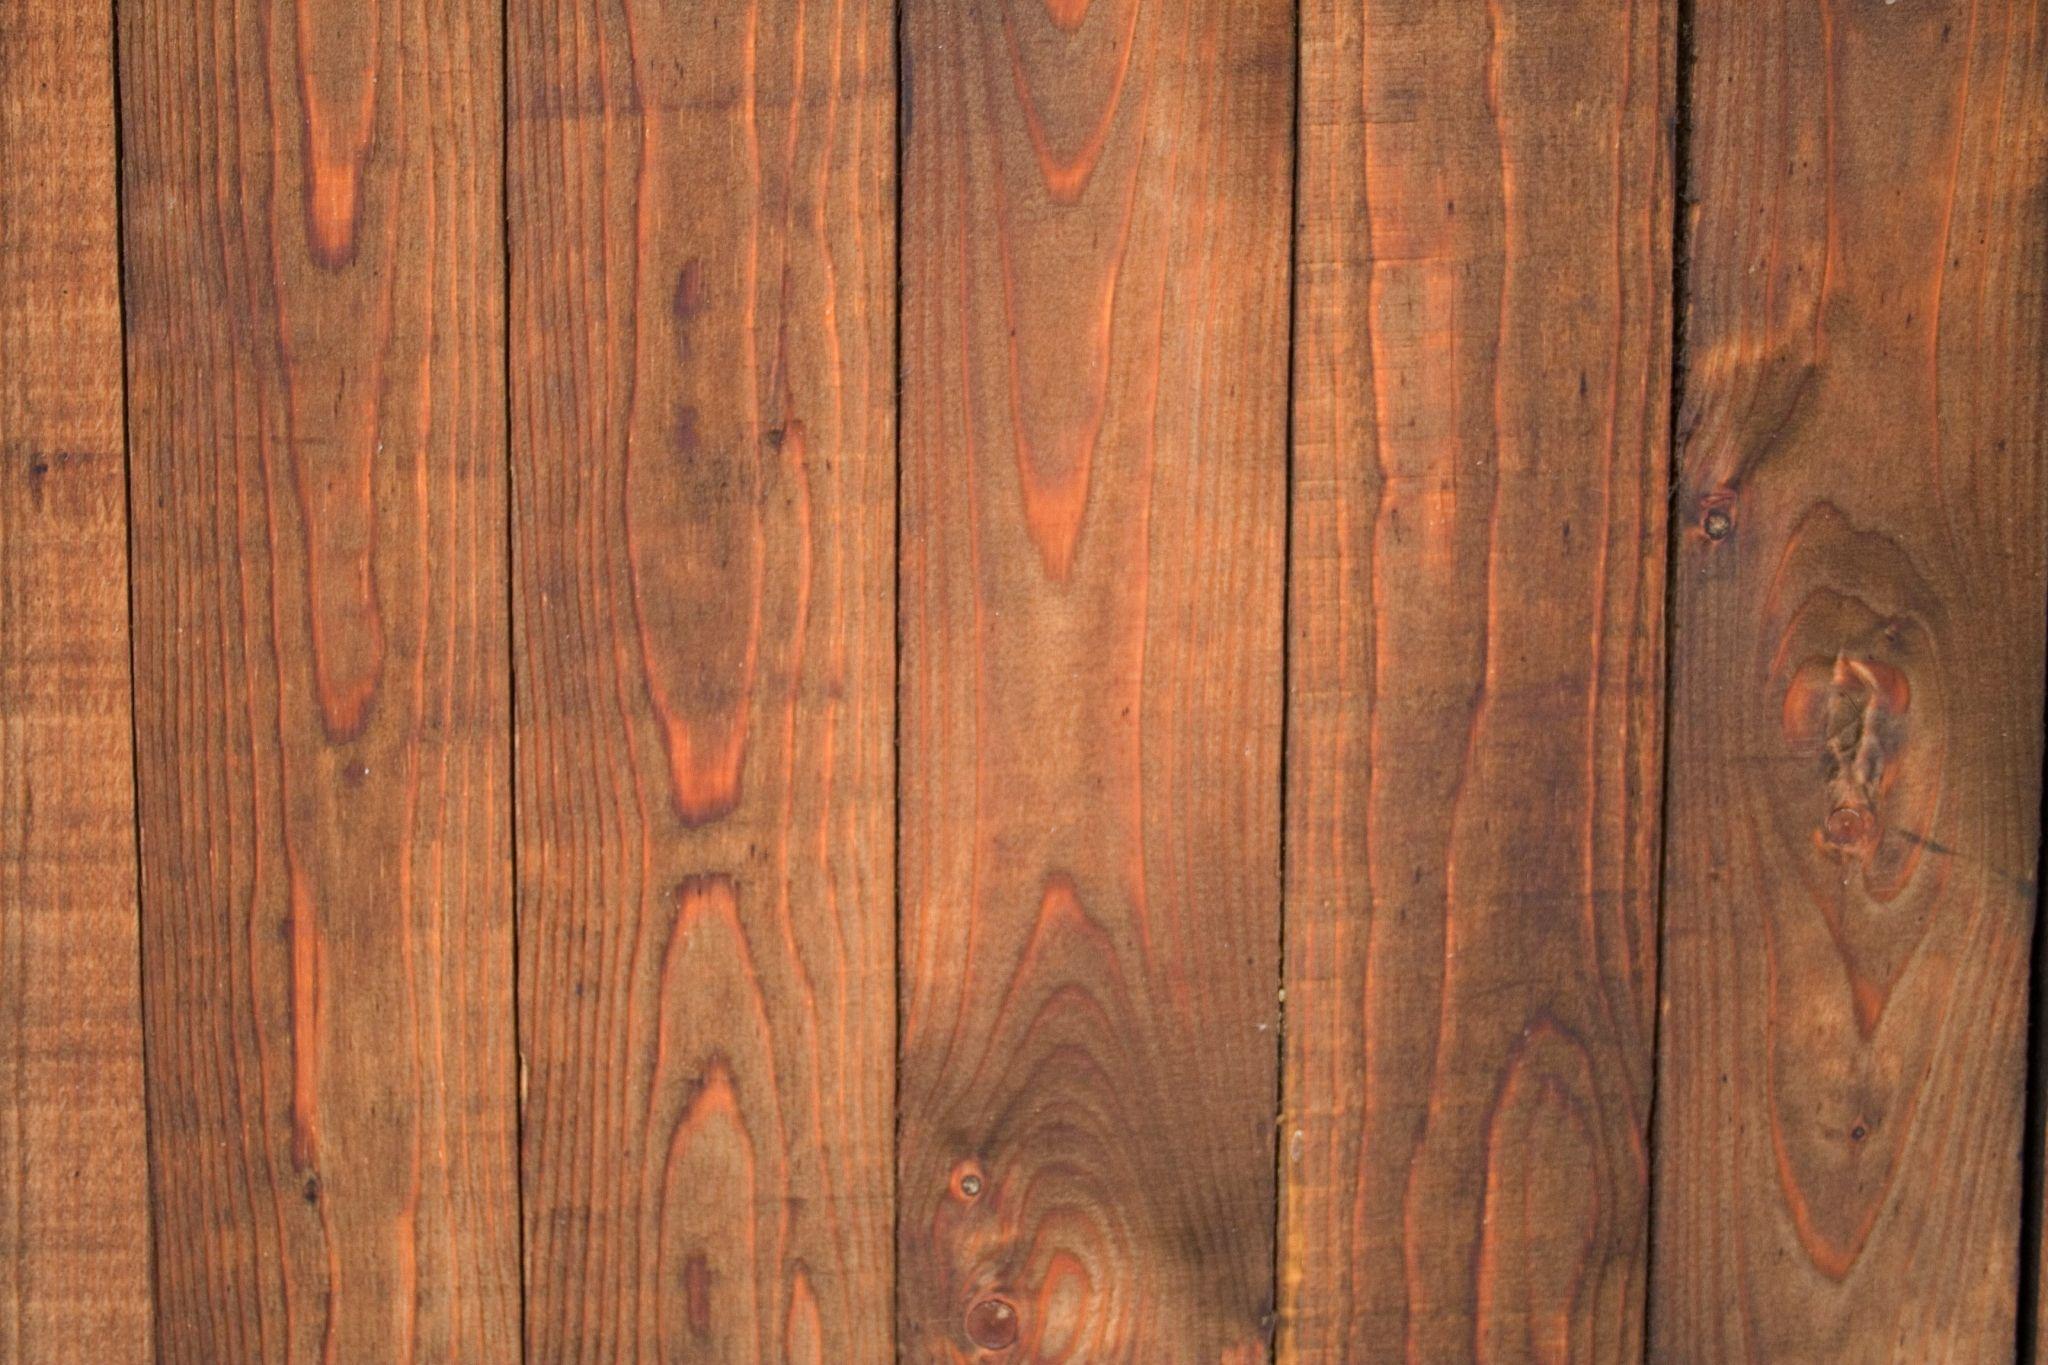 Wood Wallpaper Pack 1080p Hd Wood Wallpaper Wood Plank Texture Wood